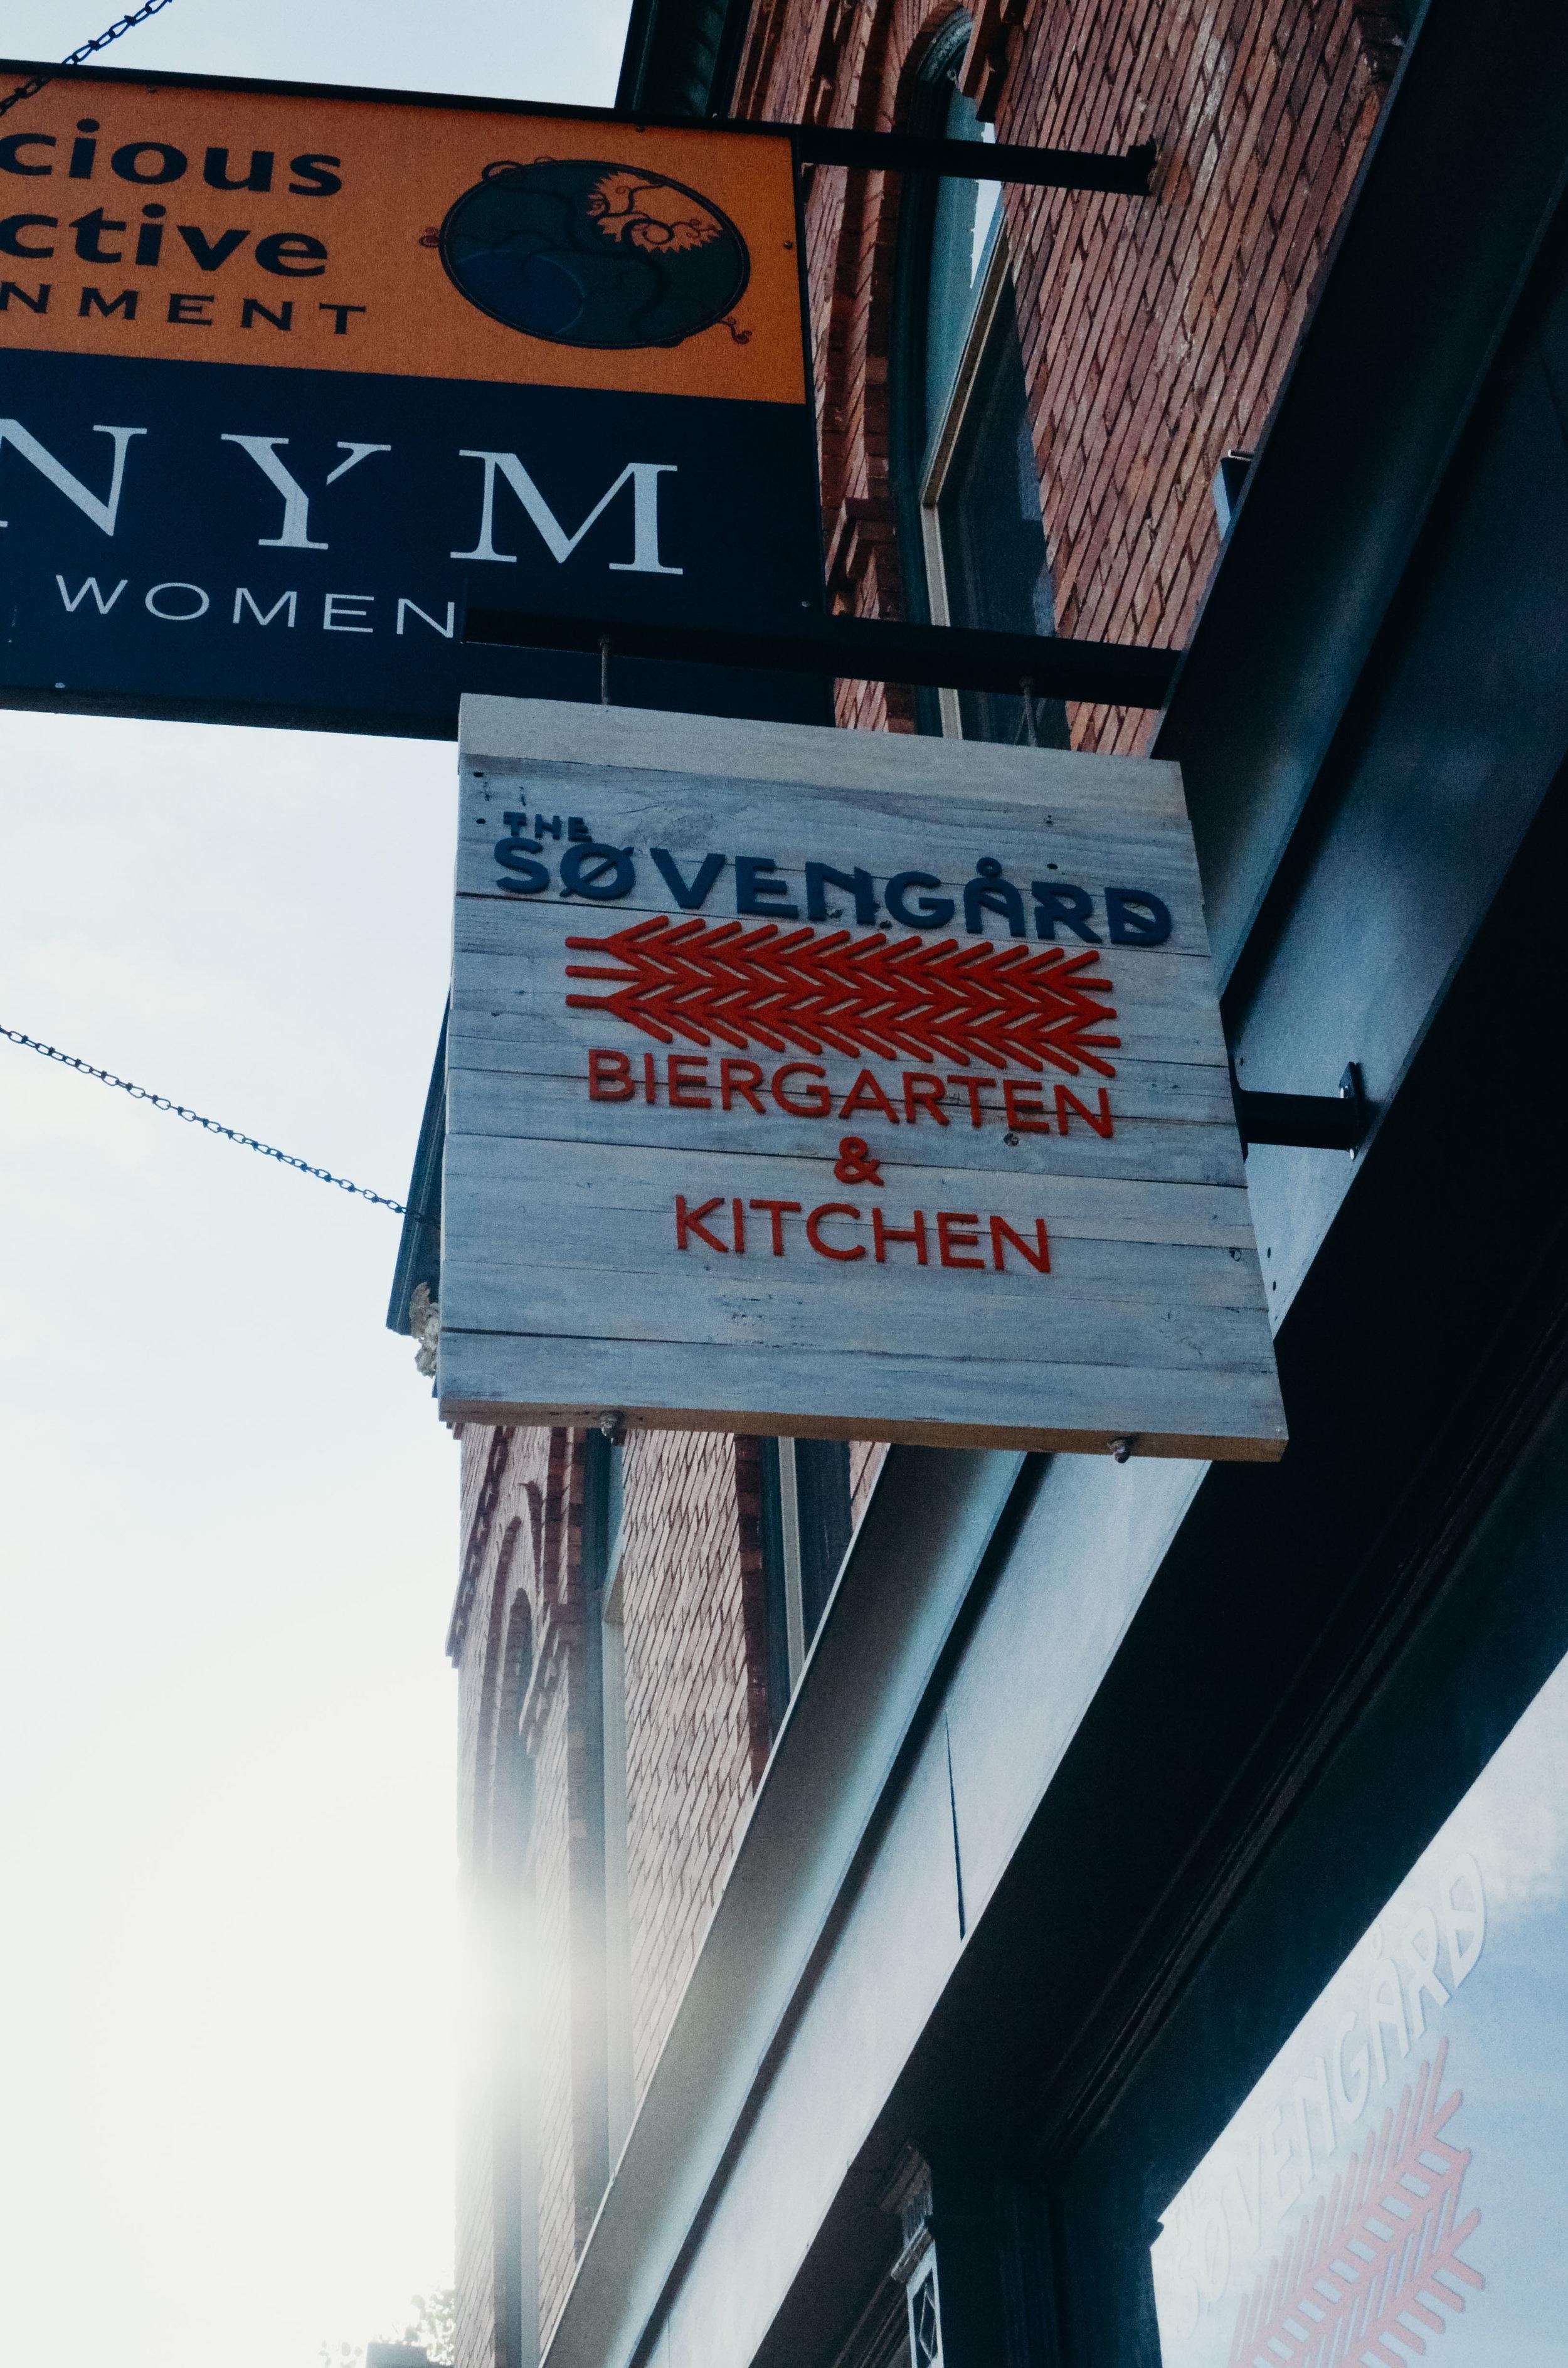 Wendling_Boyd_The_Sovengard_Dinner_With_Loved_Ones-19.jpg